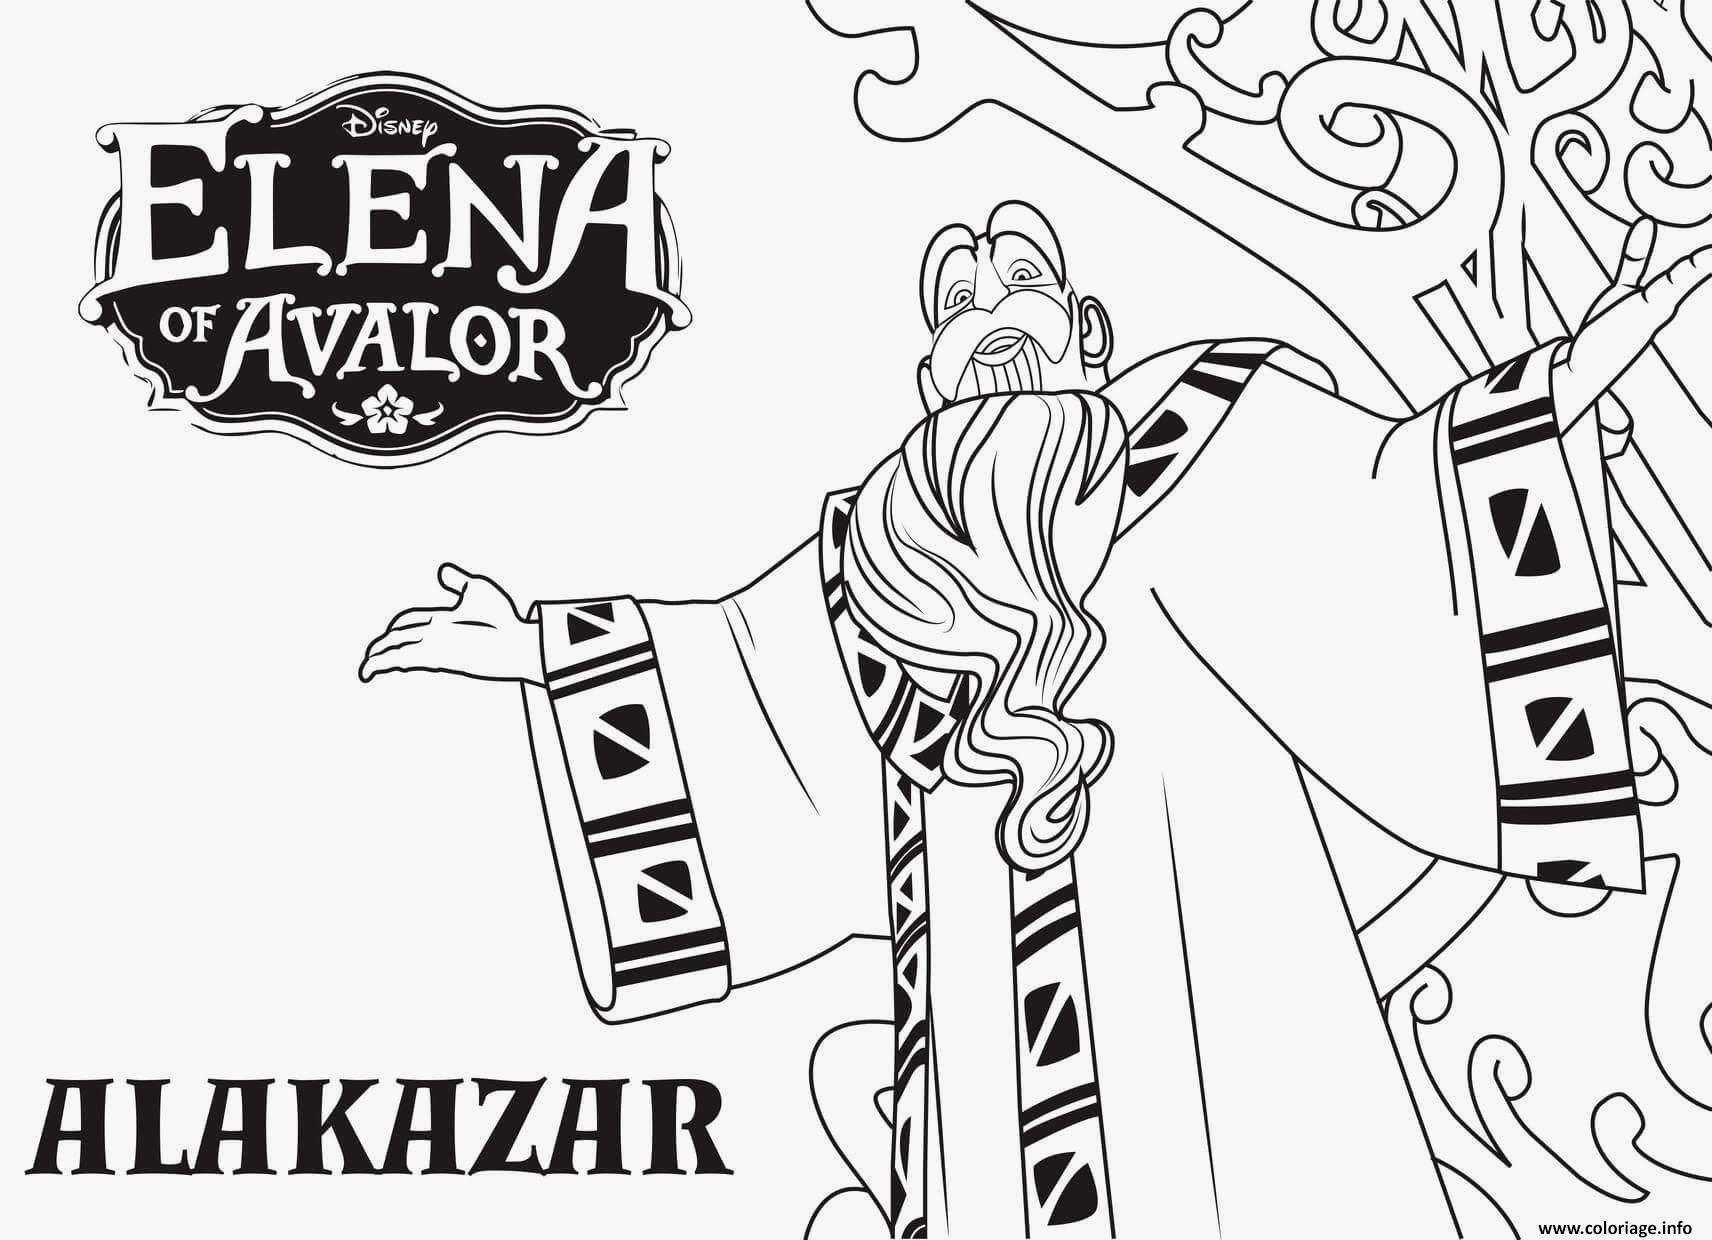 Coloriage Disney Schwarze Katze Coloriage Vaiana Disney Elena Of Avalor 797377 Hd Wallpaper Backgrounds Download